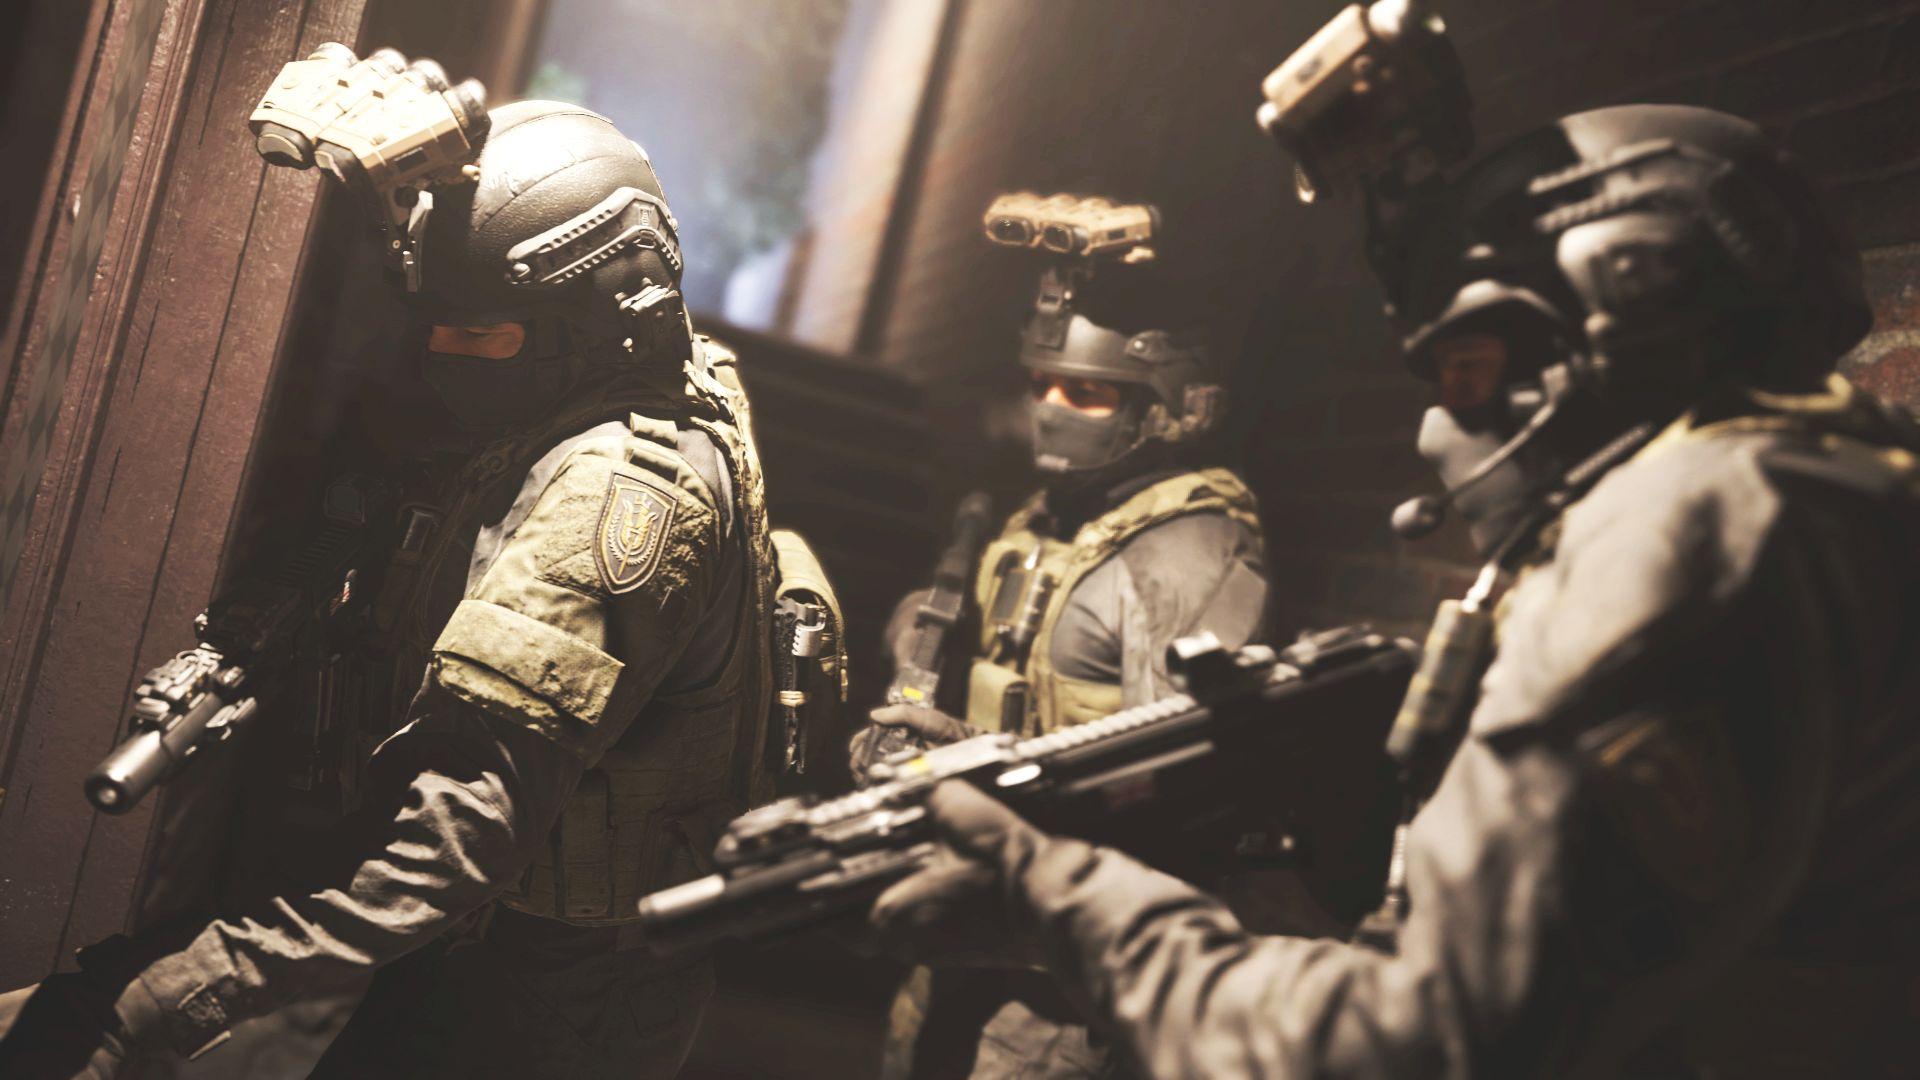 Call Of Duty Modern Warfare Cross Play Matchmaking Is Based On